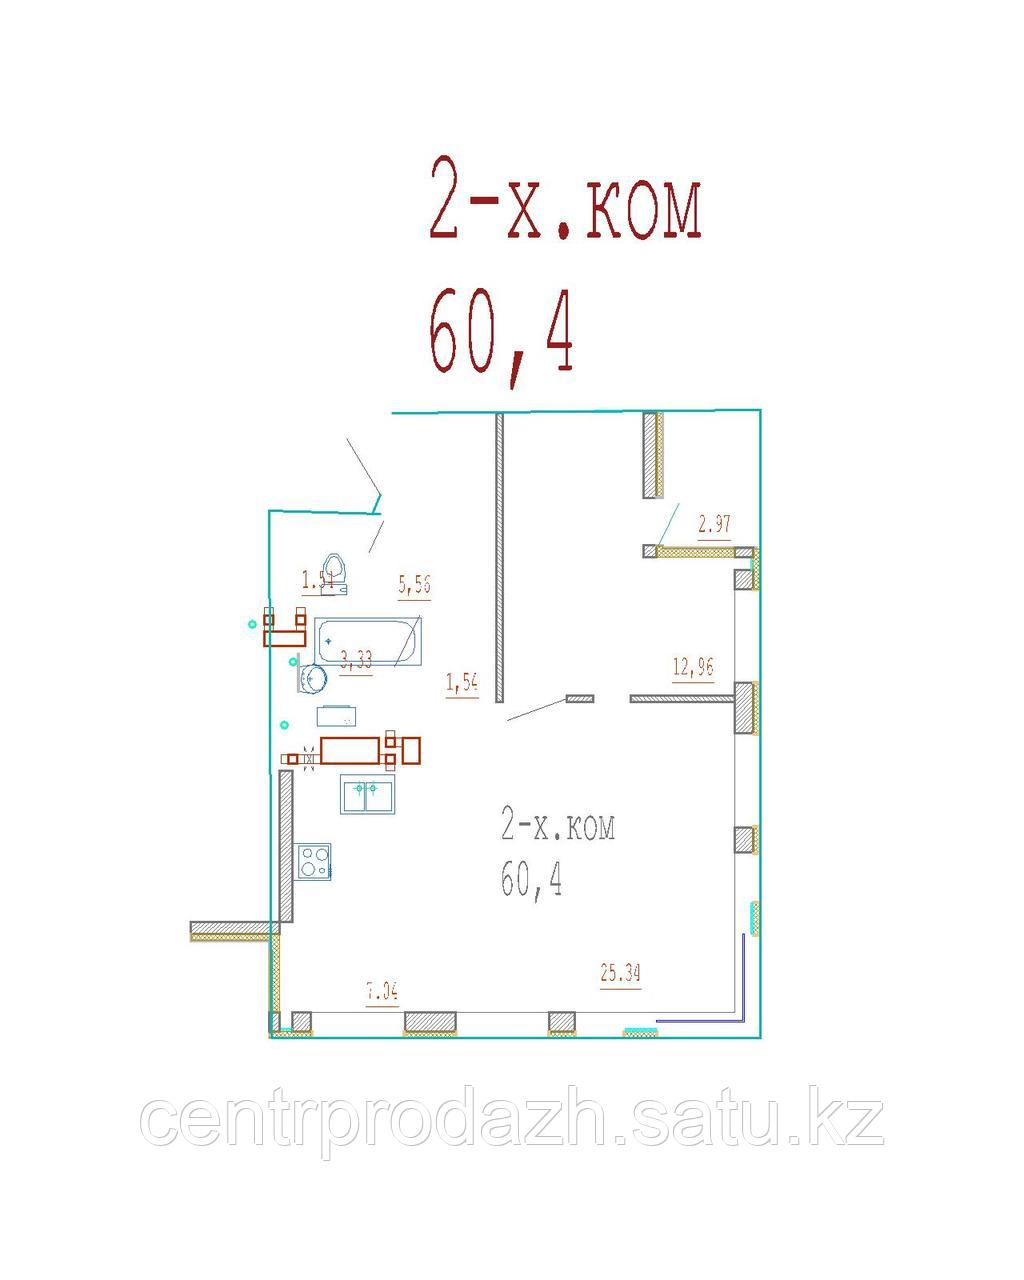 2 комнатная квартира в ЖК Кристалл 2 60.4 м²